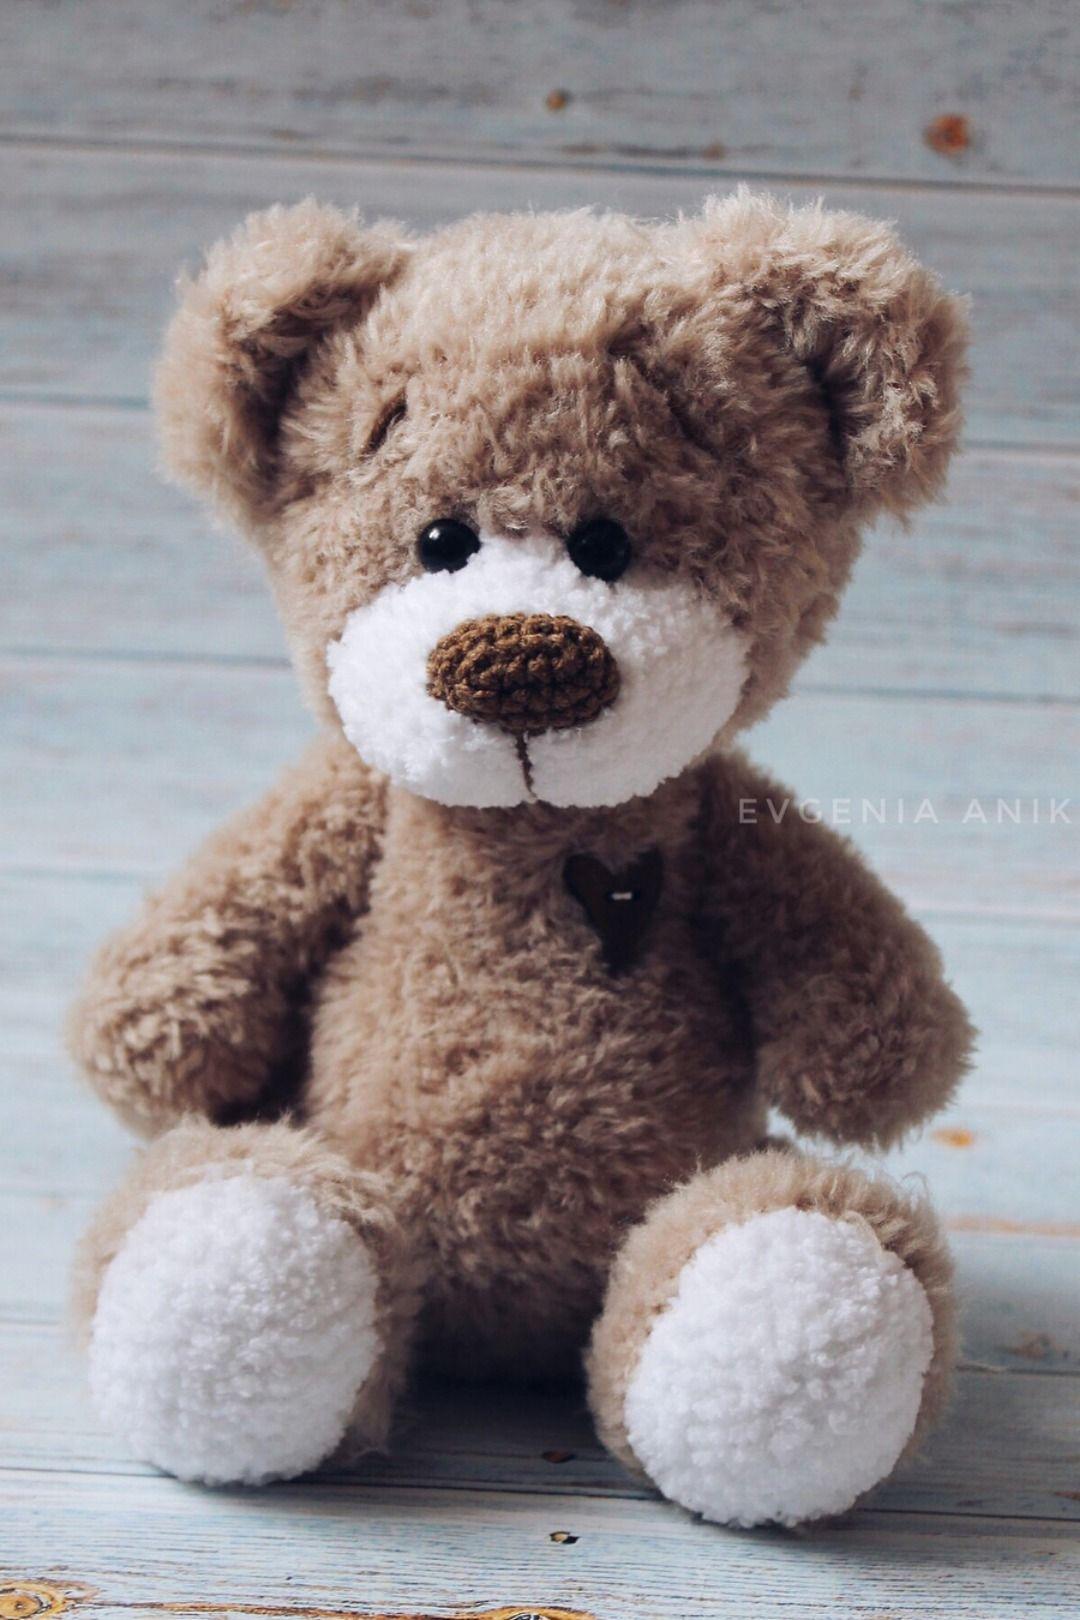 Crochet PATTERN Teddy Bear / Amigurumi pattern toy bear Teddy bear tutorial / bear gift Mother's day #babyteddybear